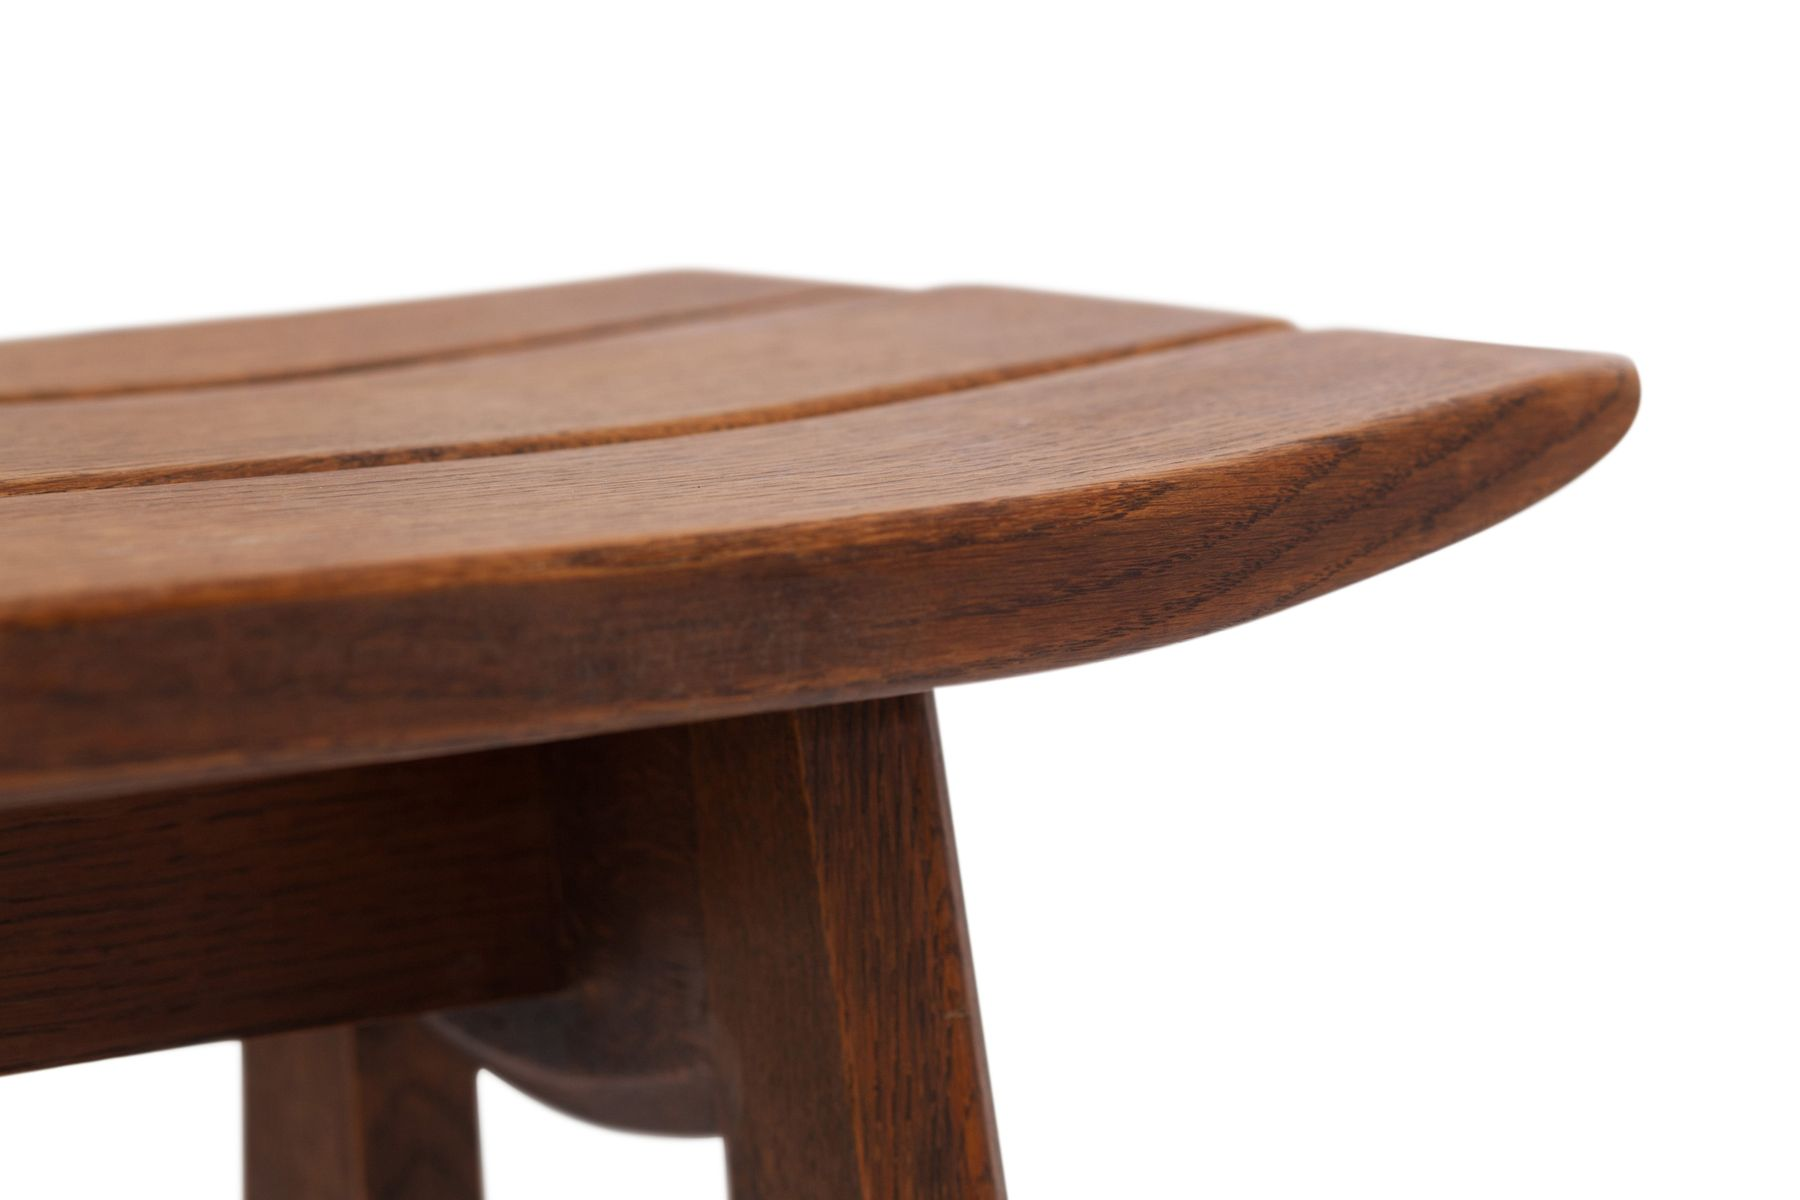 oak tabourets by guillerme chambron for votre maison. Black Bedroom Furniture Sets. Home Design Ideas